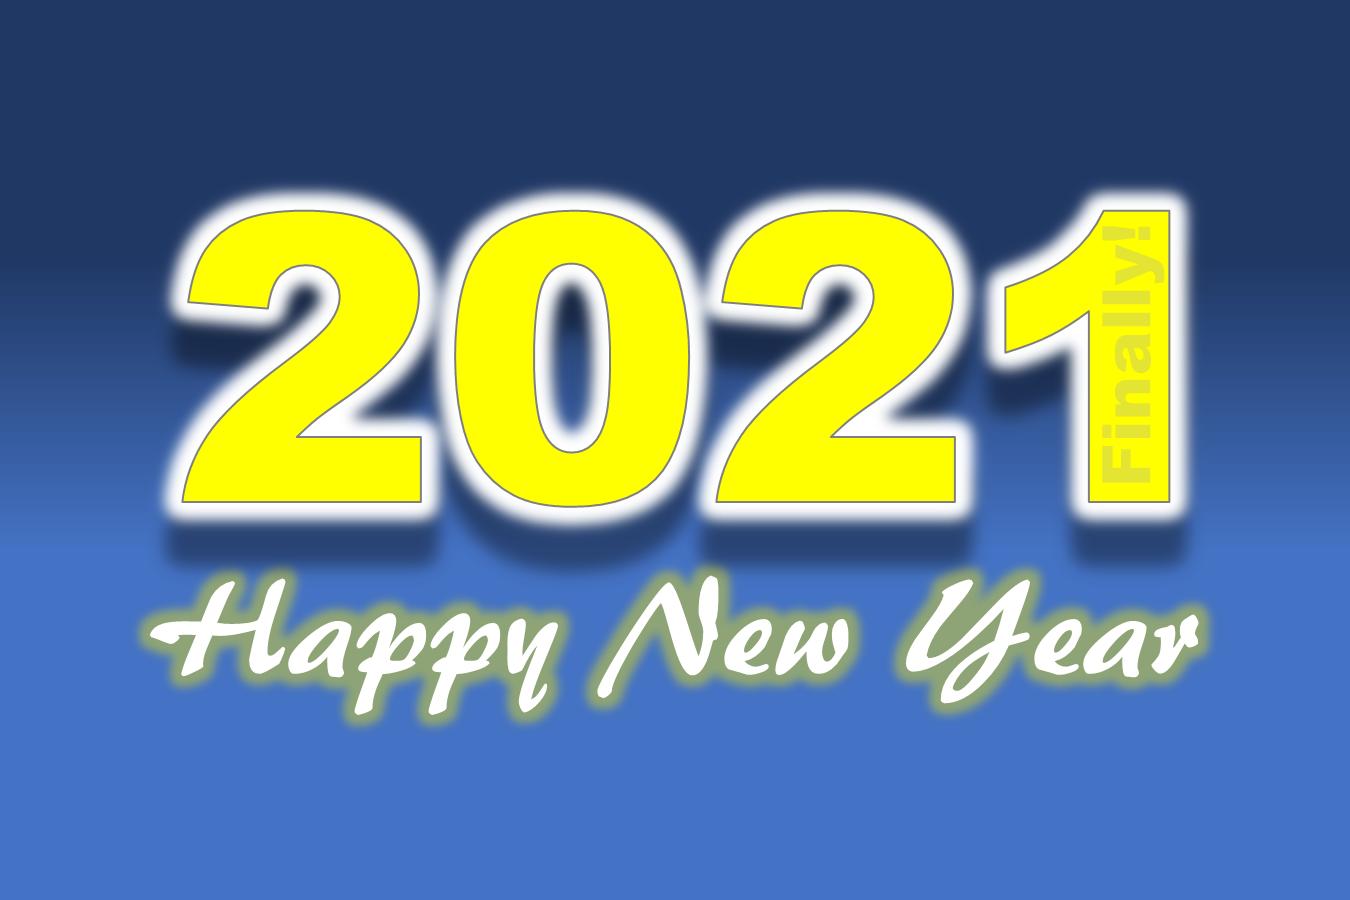 2021-01-01 Happy New Year